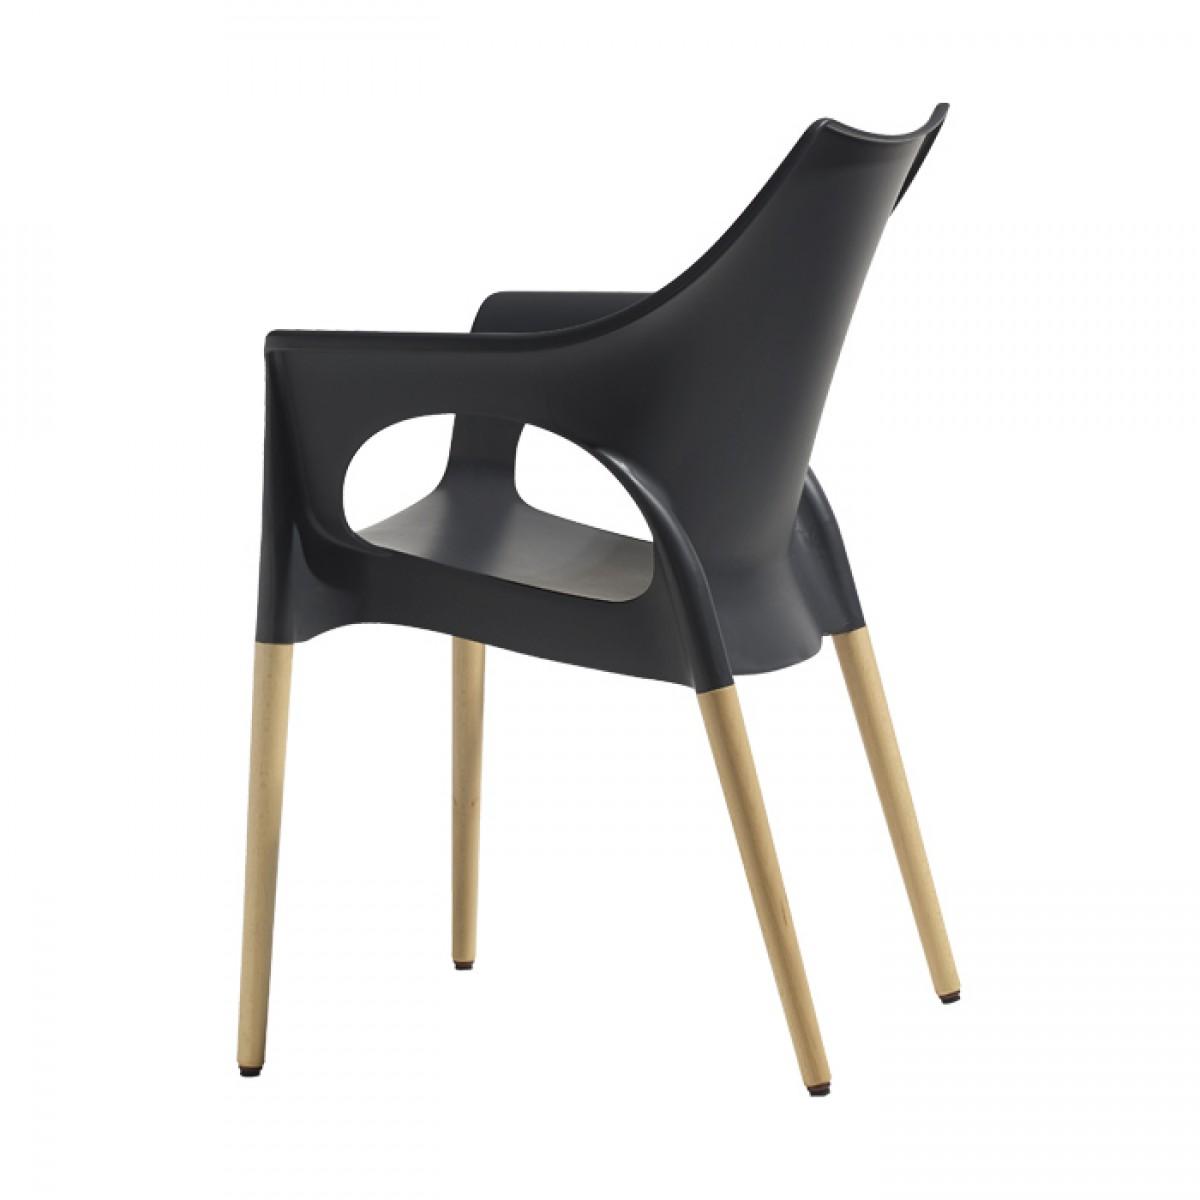 Krzesło do salonu Natural Ola Scab Design